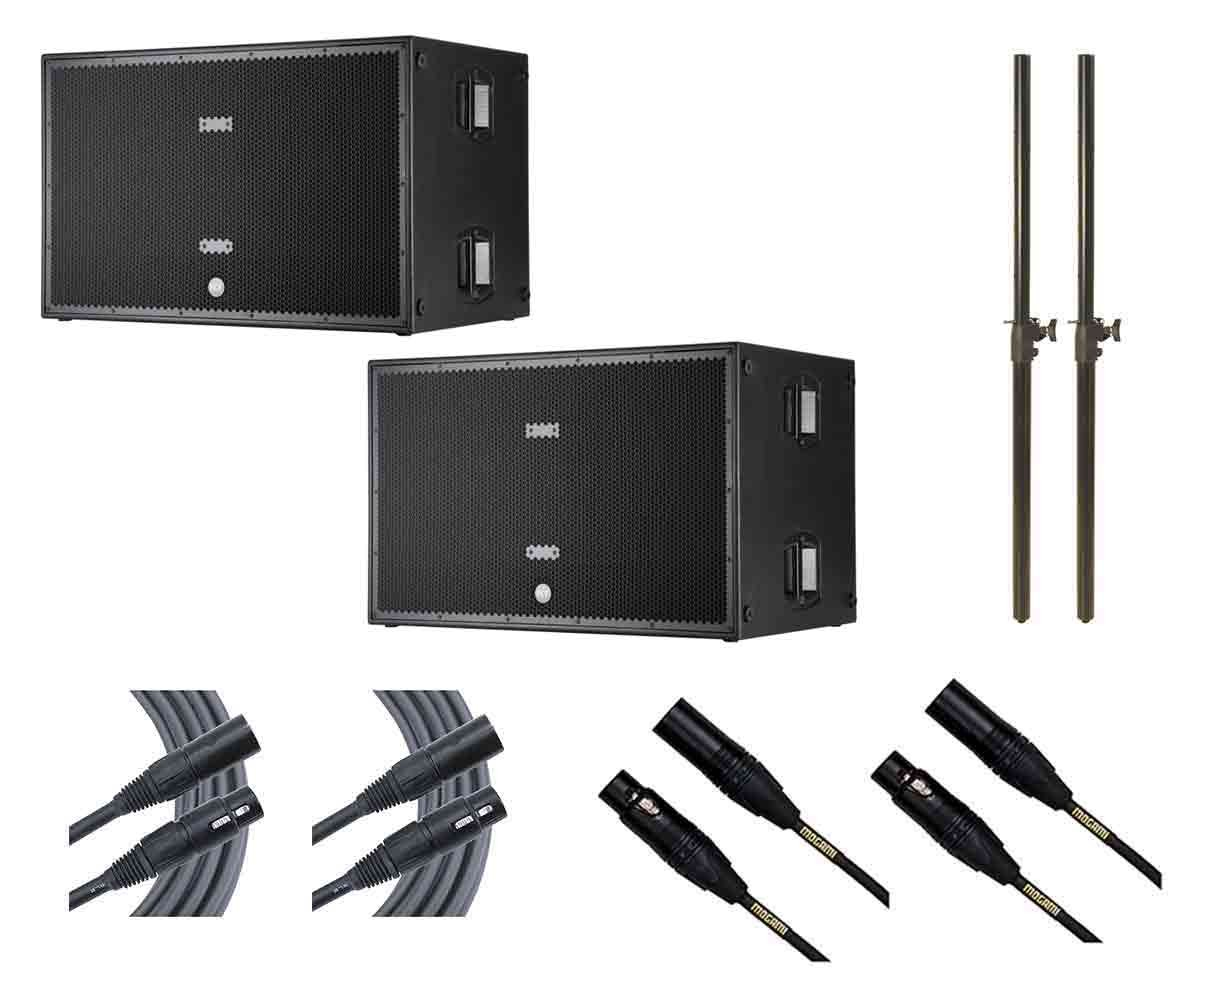 2x RCF SUB 8006-AS + Subwoofer Poles + Mogami Cables